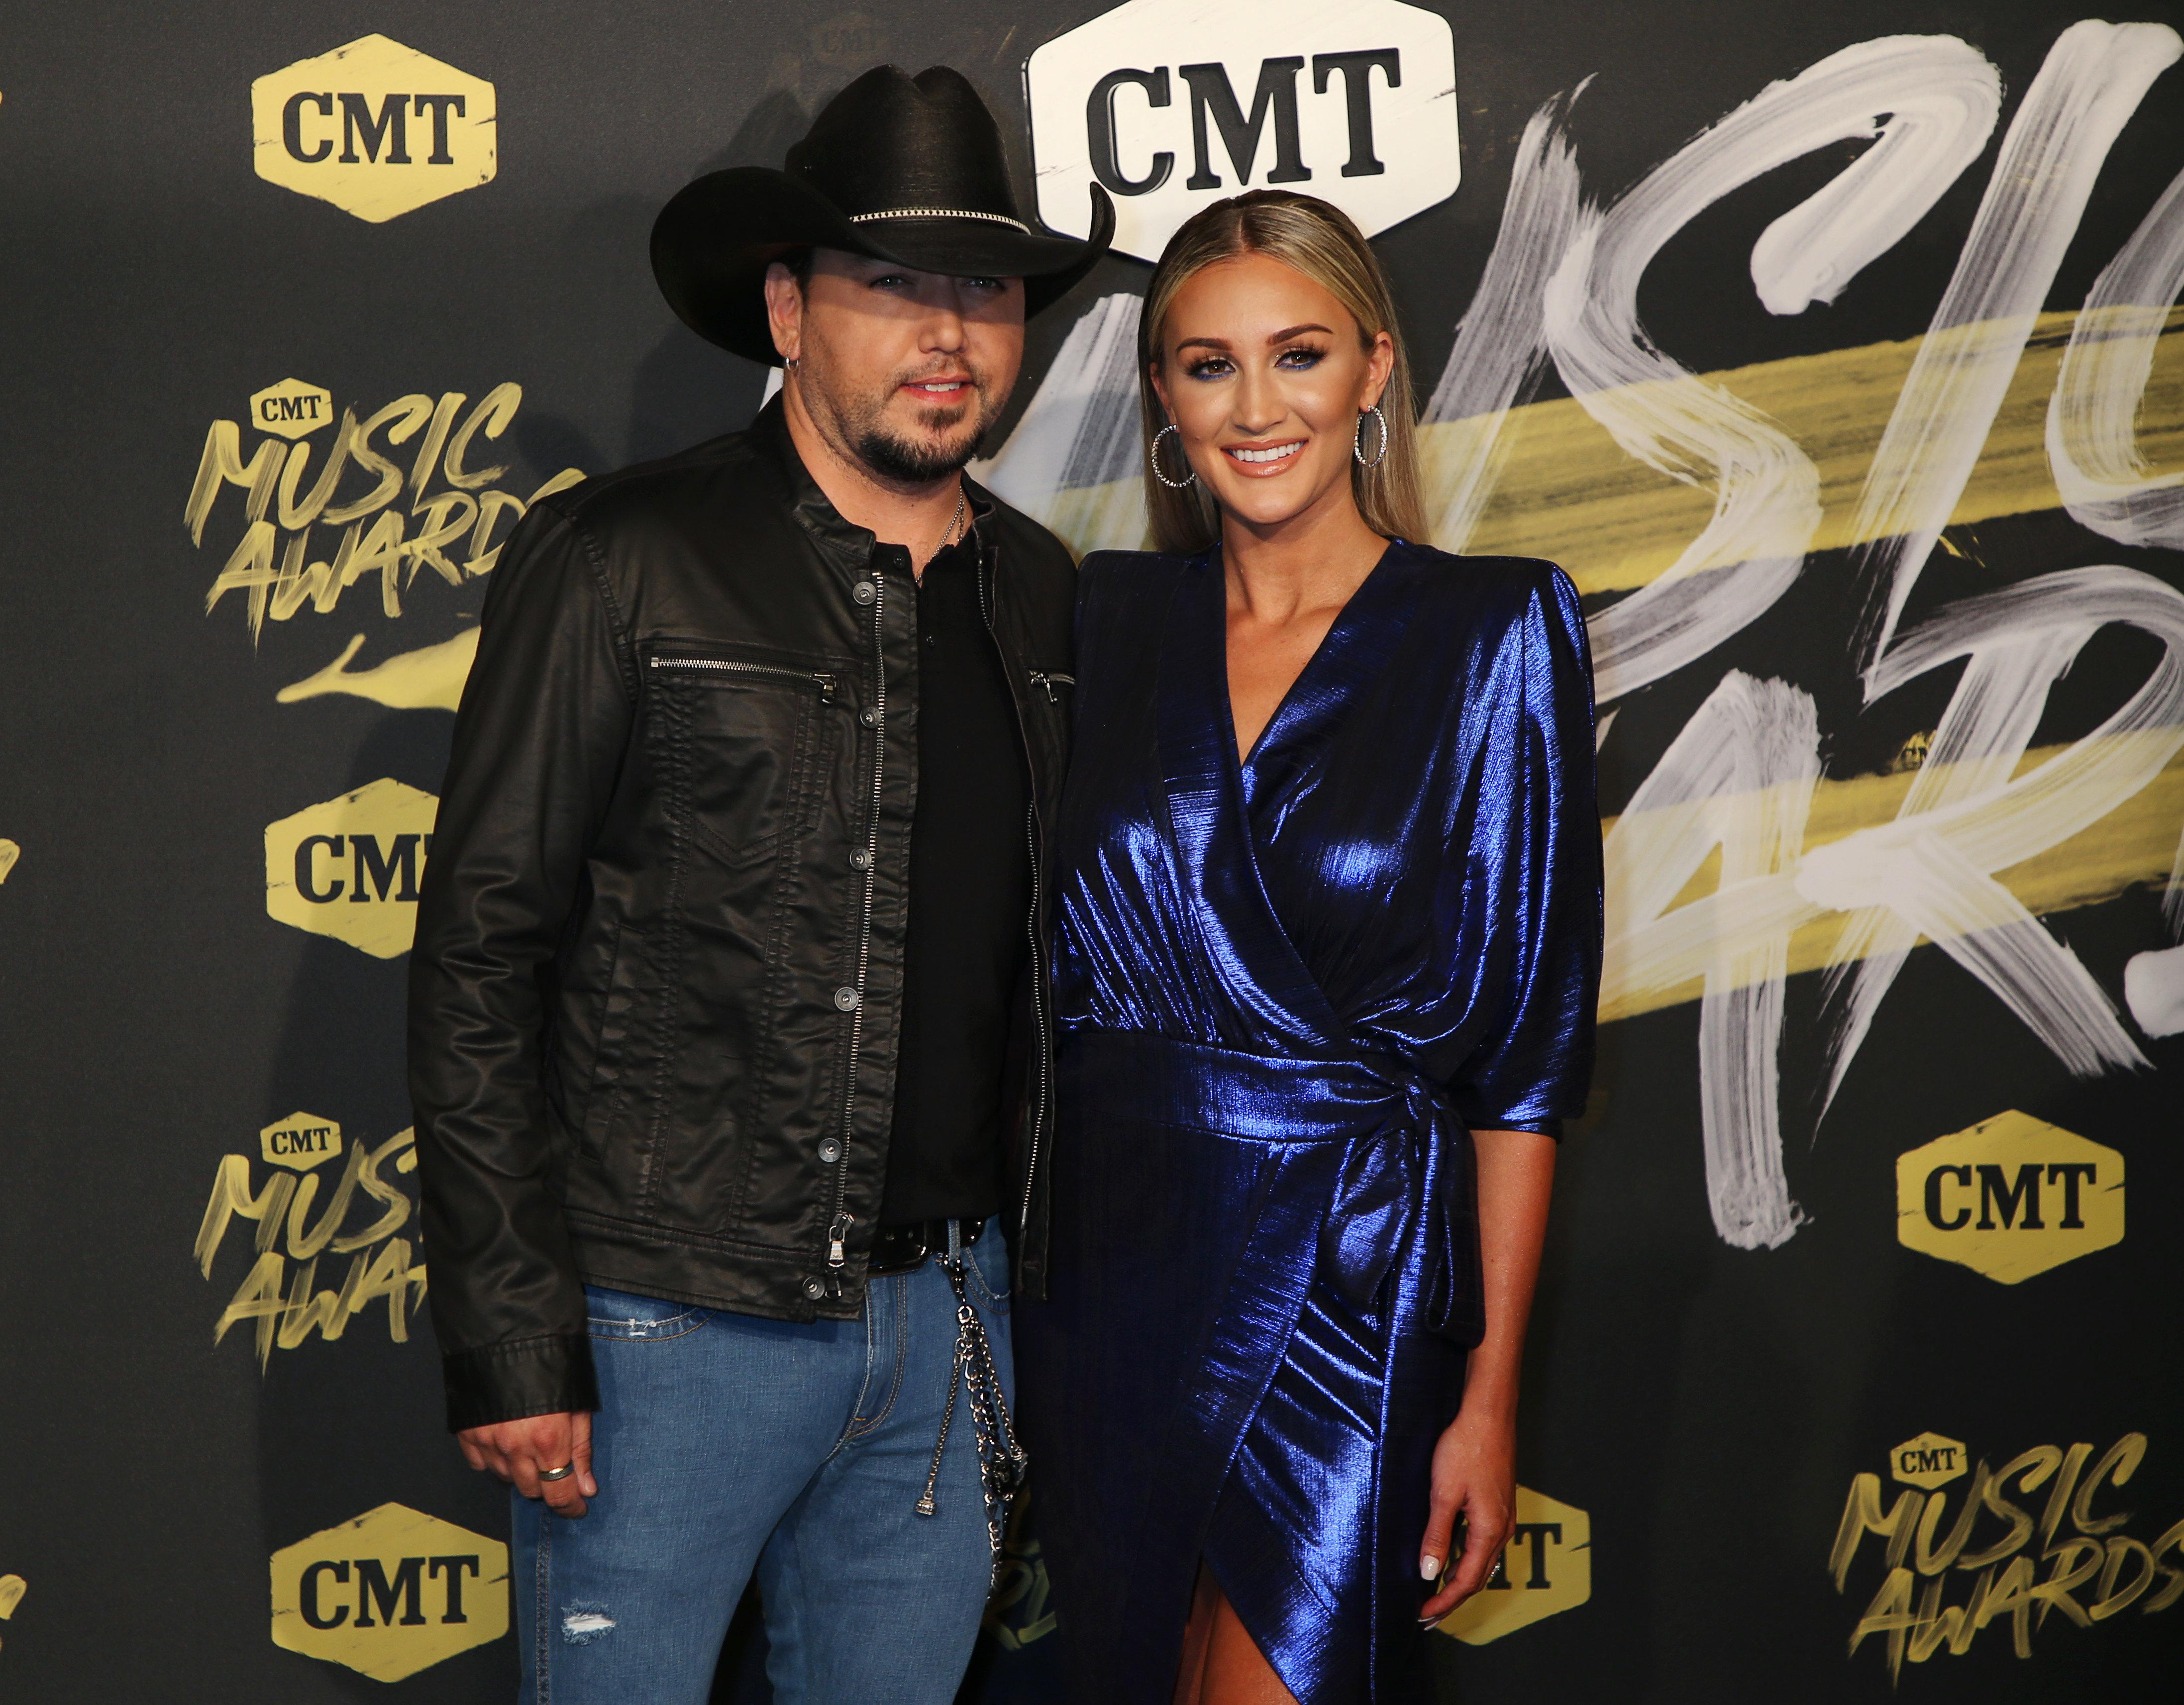 2018 CMT Music Awards - Arrivals - Nashville, Tennessee, U.S., June 6, 2018 - Jason Aldean and Brittany Kerr. REUTERS/Jamie Gilliam